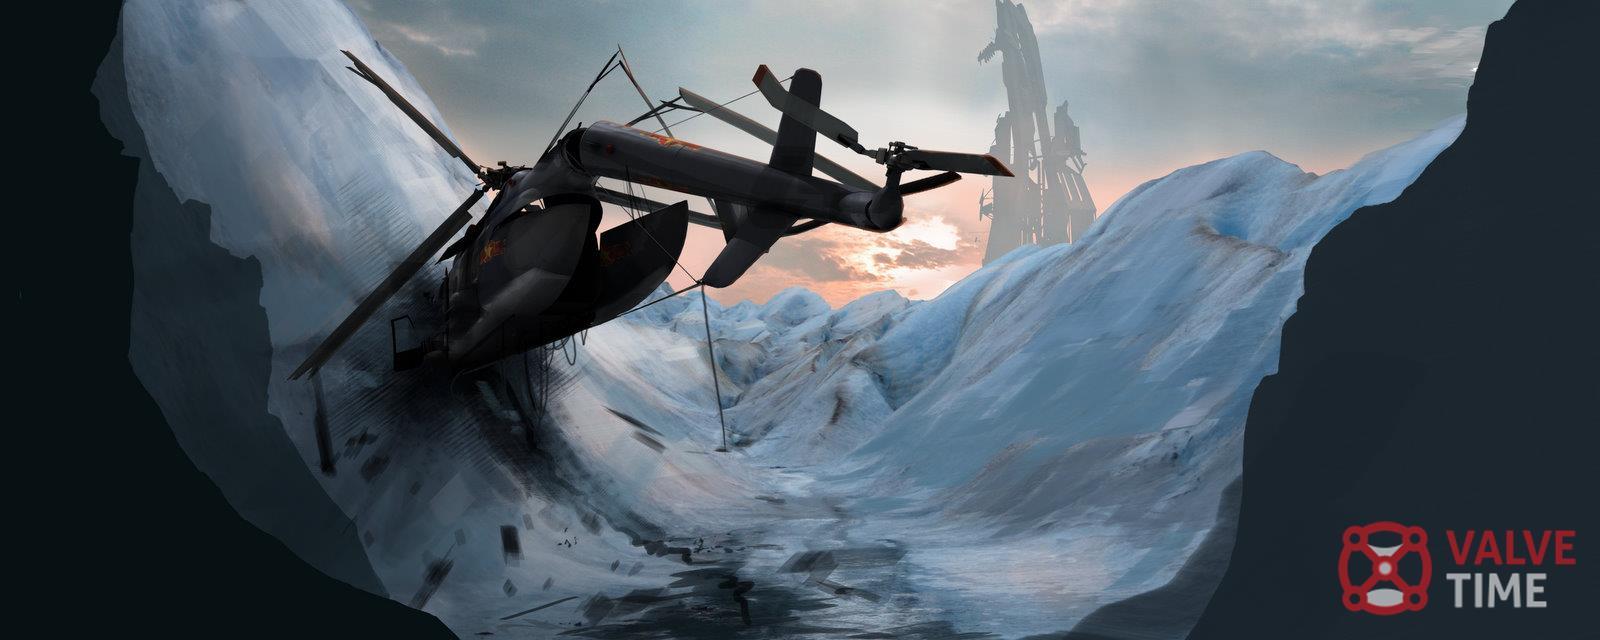 Old Art E3 - Half-Life 2